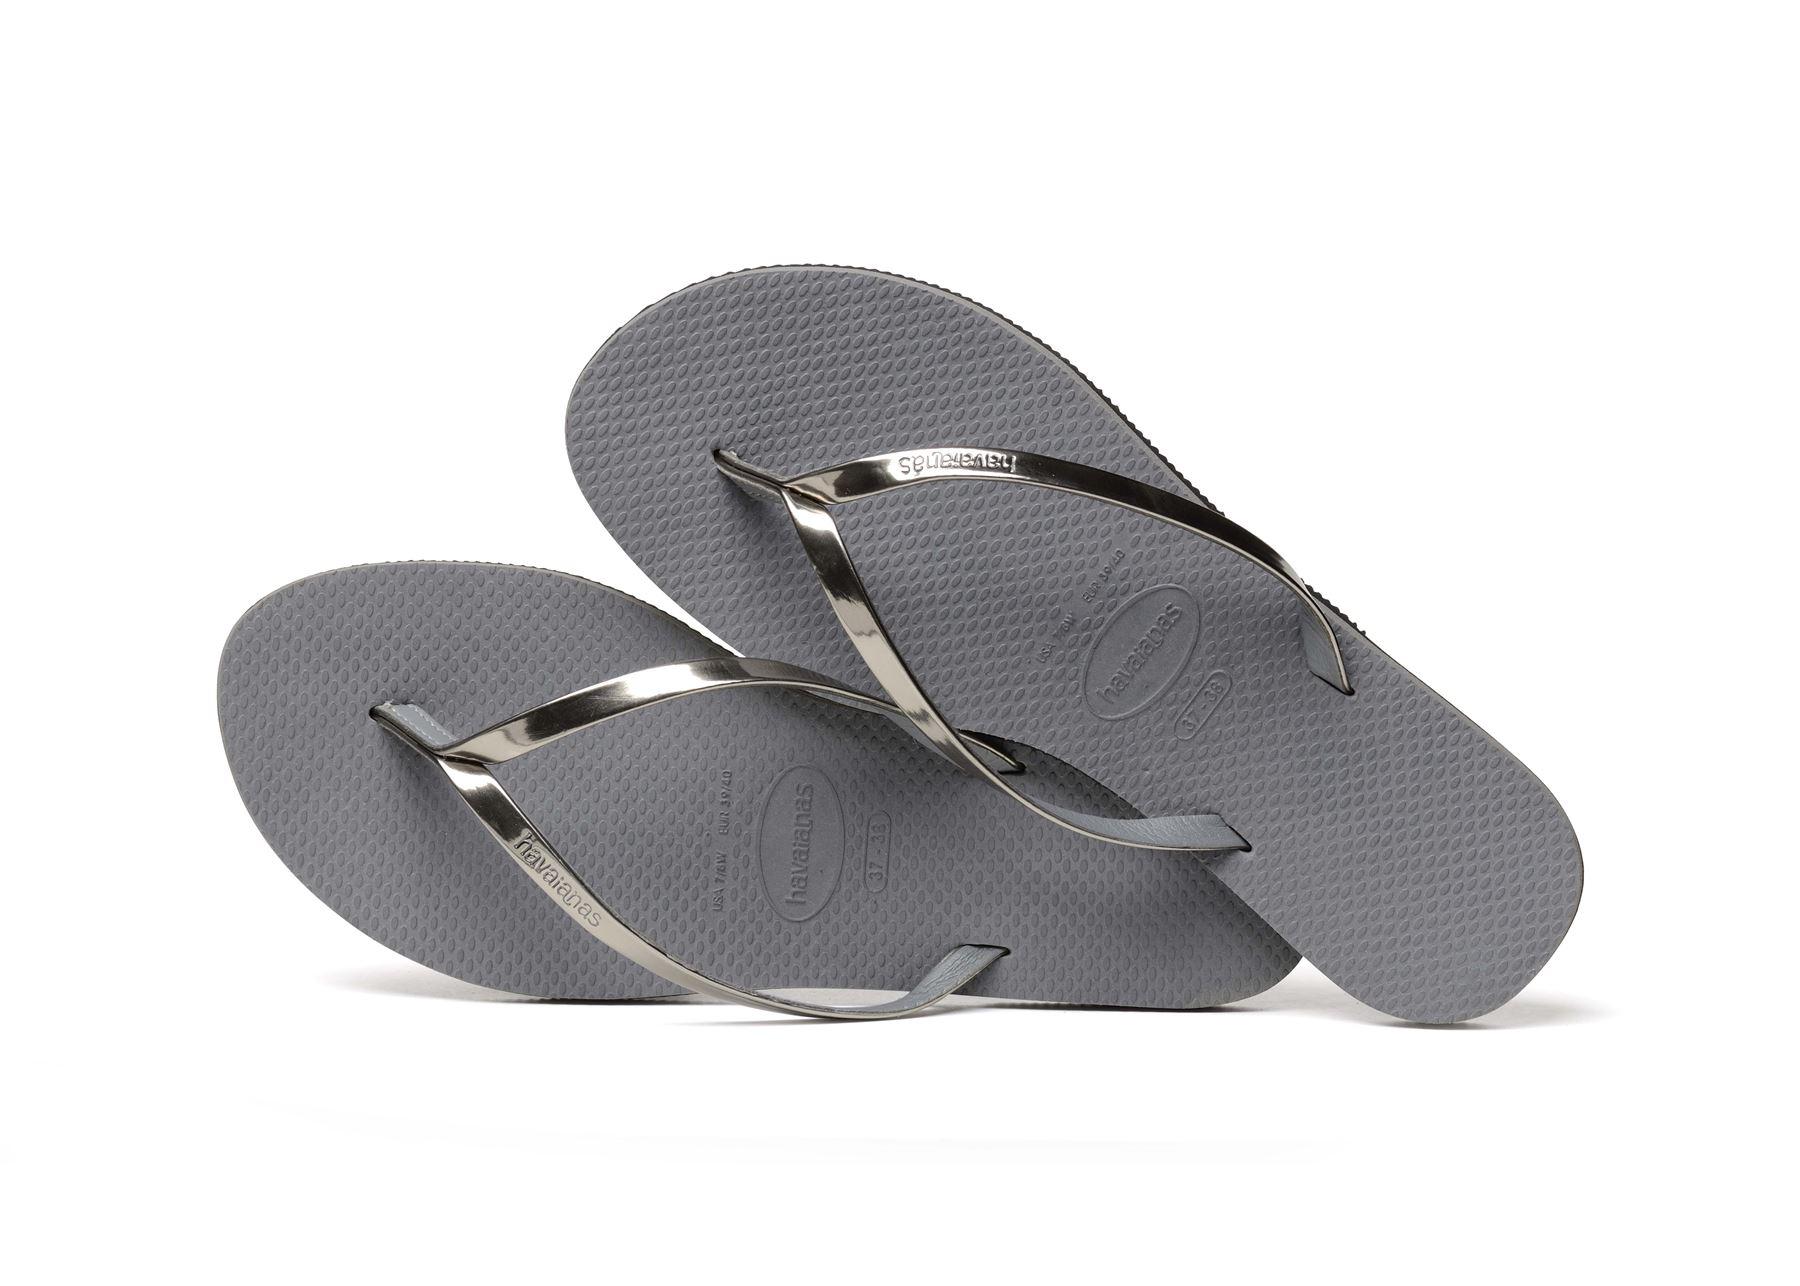 Havaianas-You-Metallic-Flip-Flops-Women-Summer-Beach-Sandals-Wide-Range-Colours miniature 17